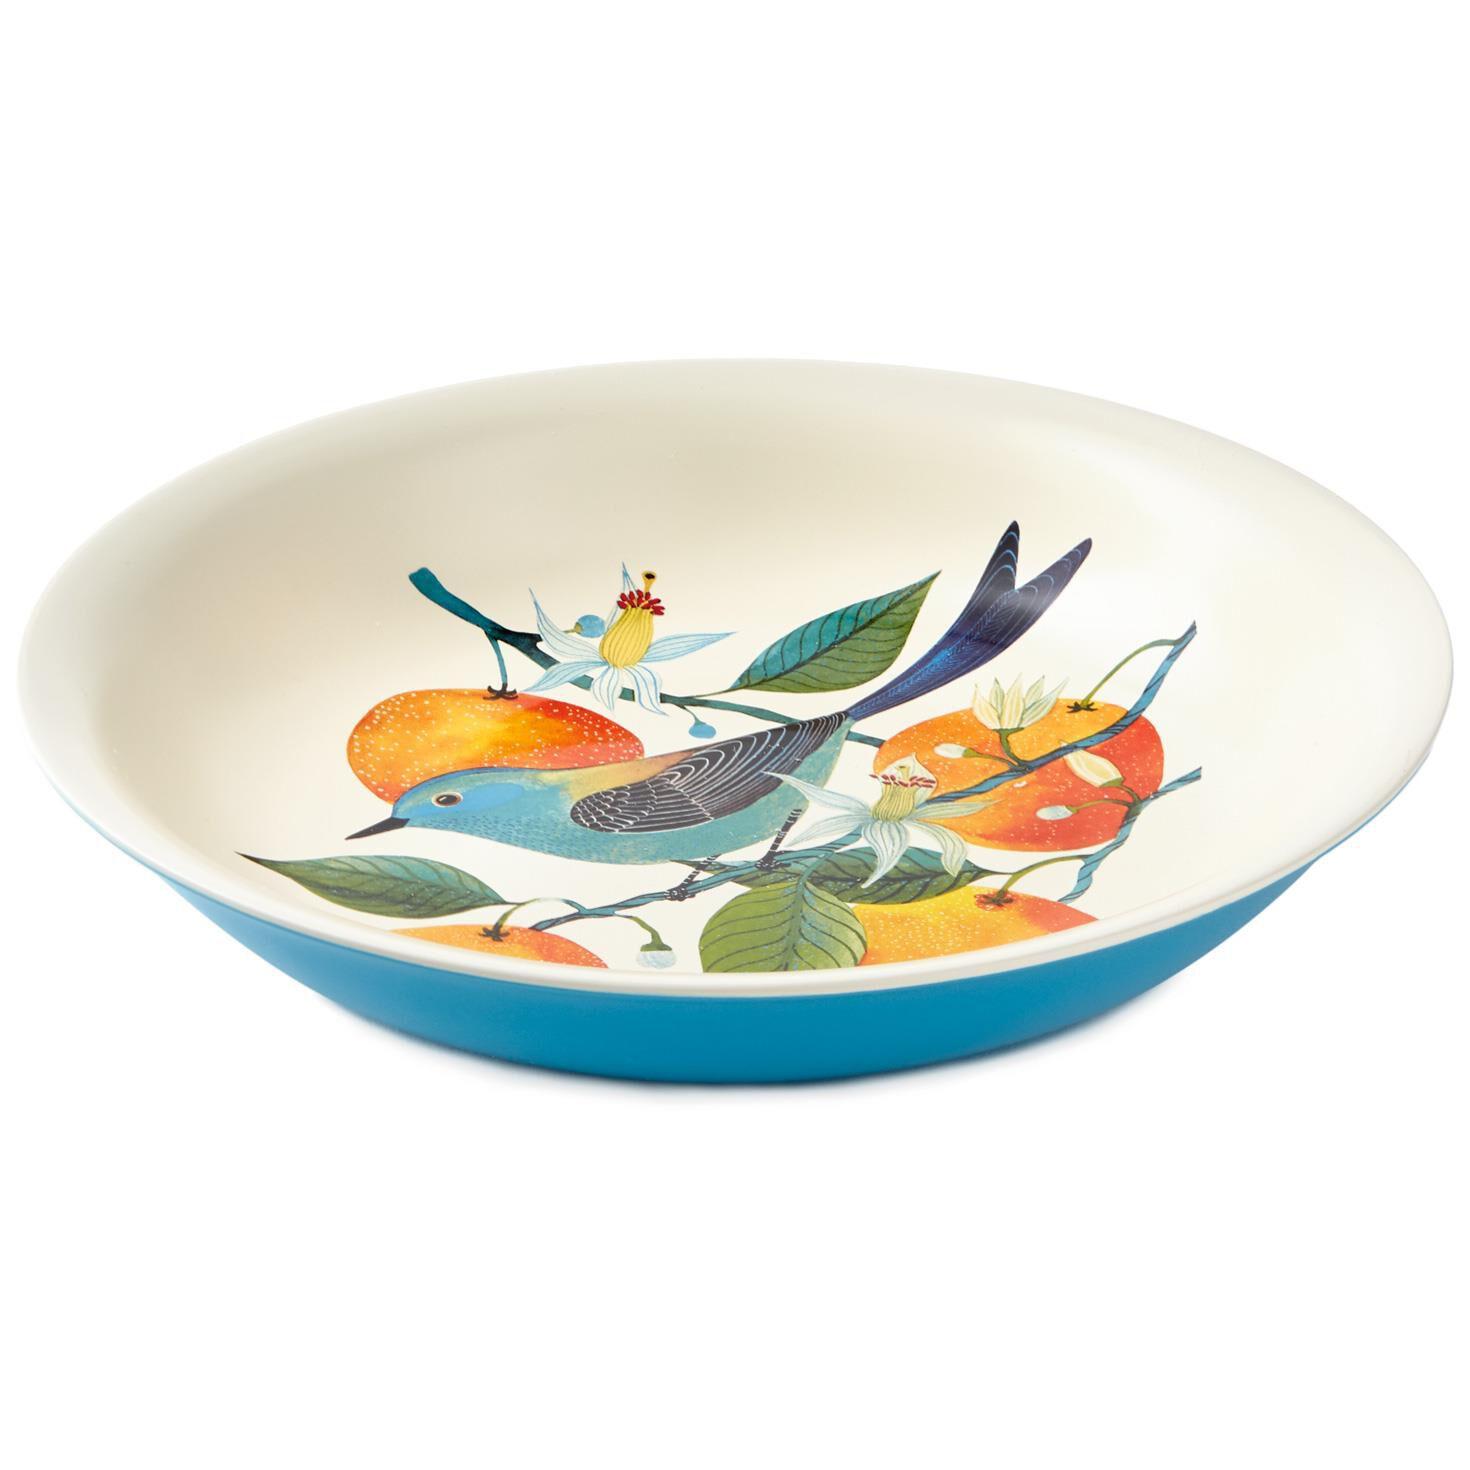 Geninne Zlatkis Bird and Citrus Ceramic Bowl 12\   sc 1 st  Hallmark Ideas & Giant Gingerbread Man Recipe | Hallmark Ideas \u0026 Inspiration